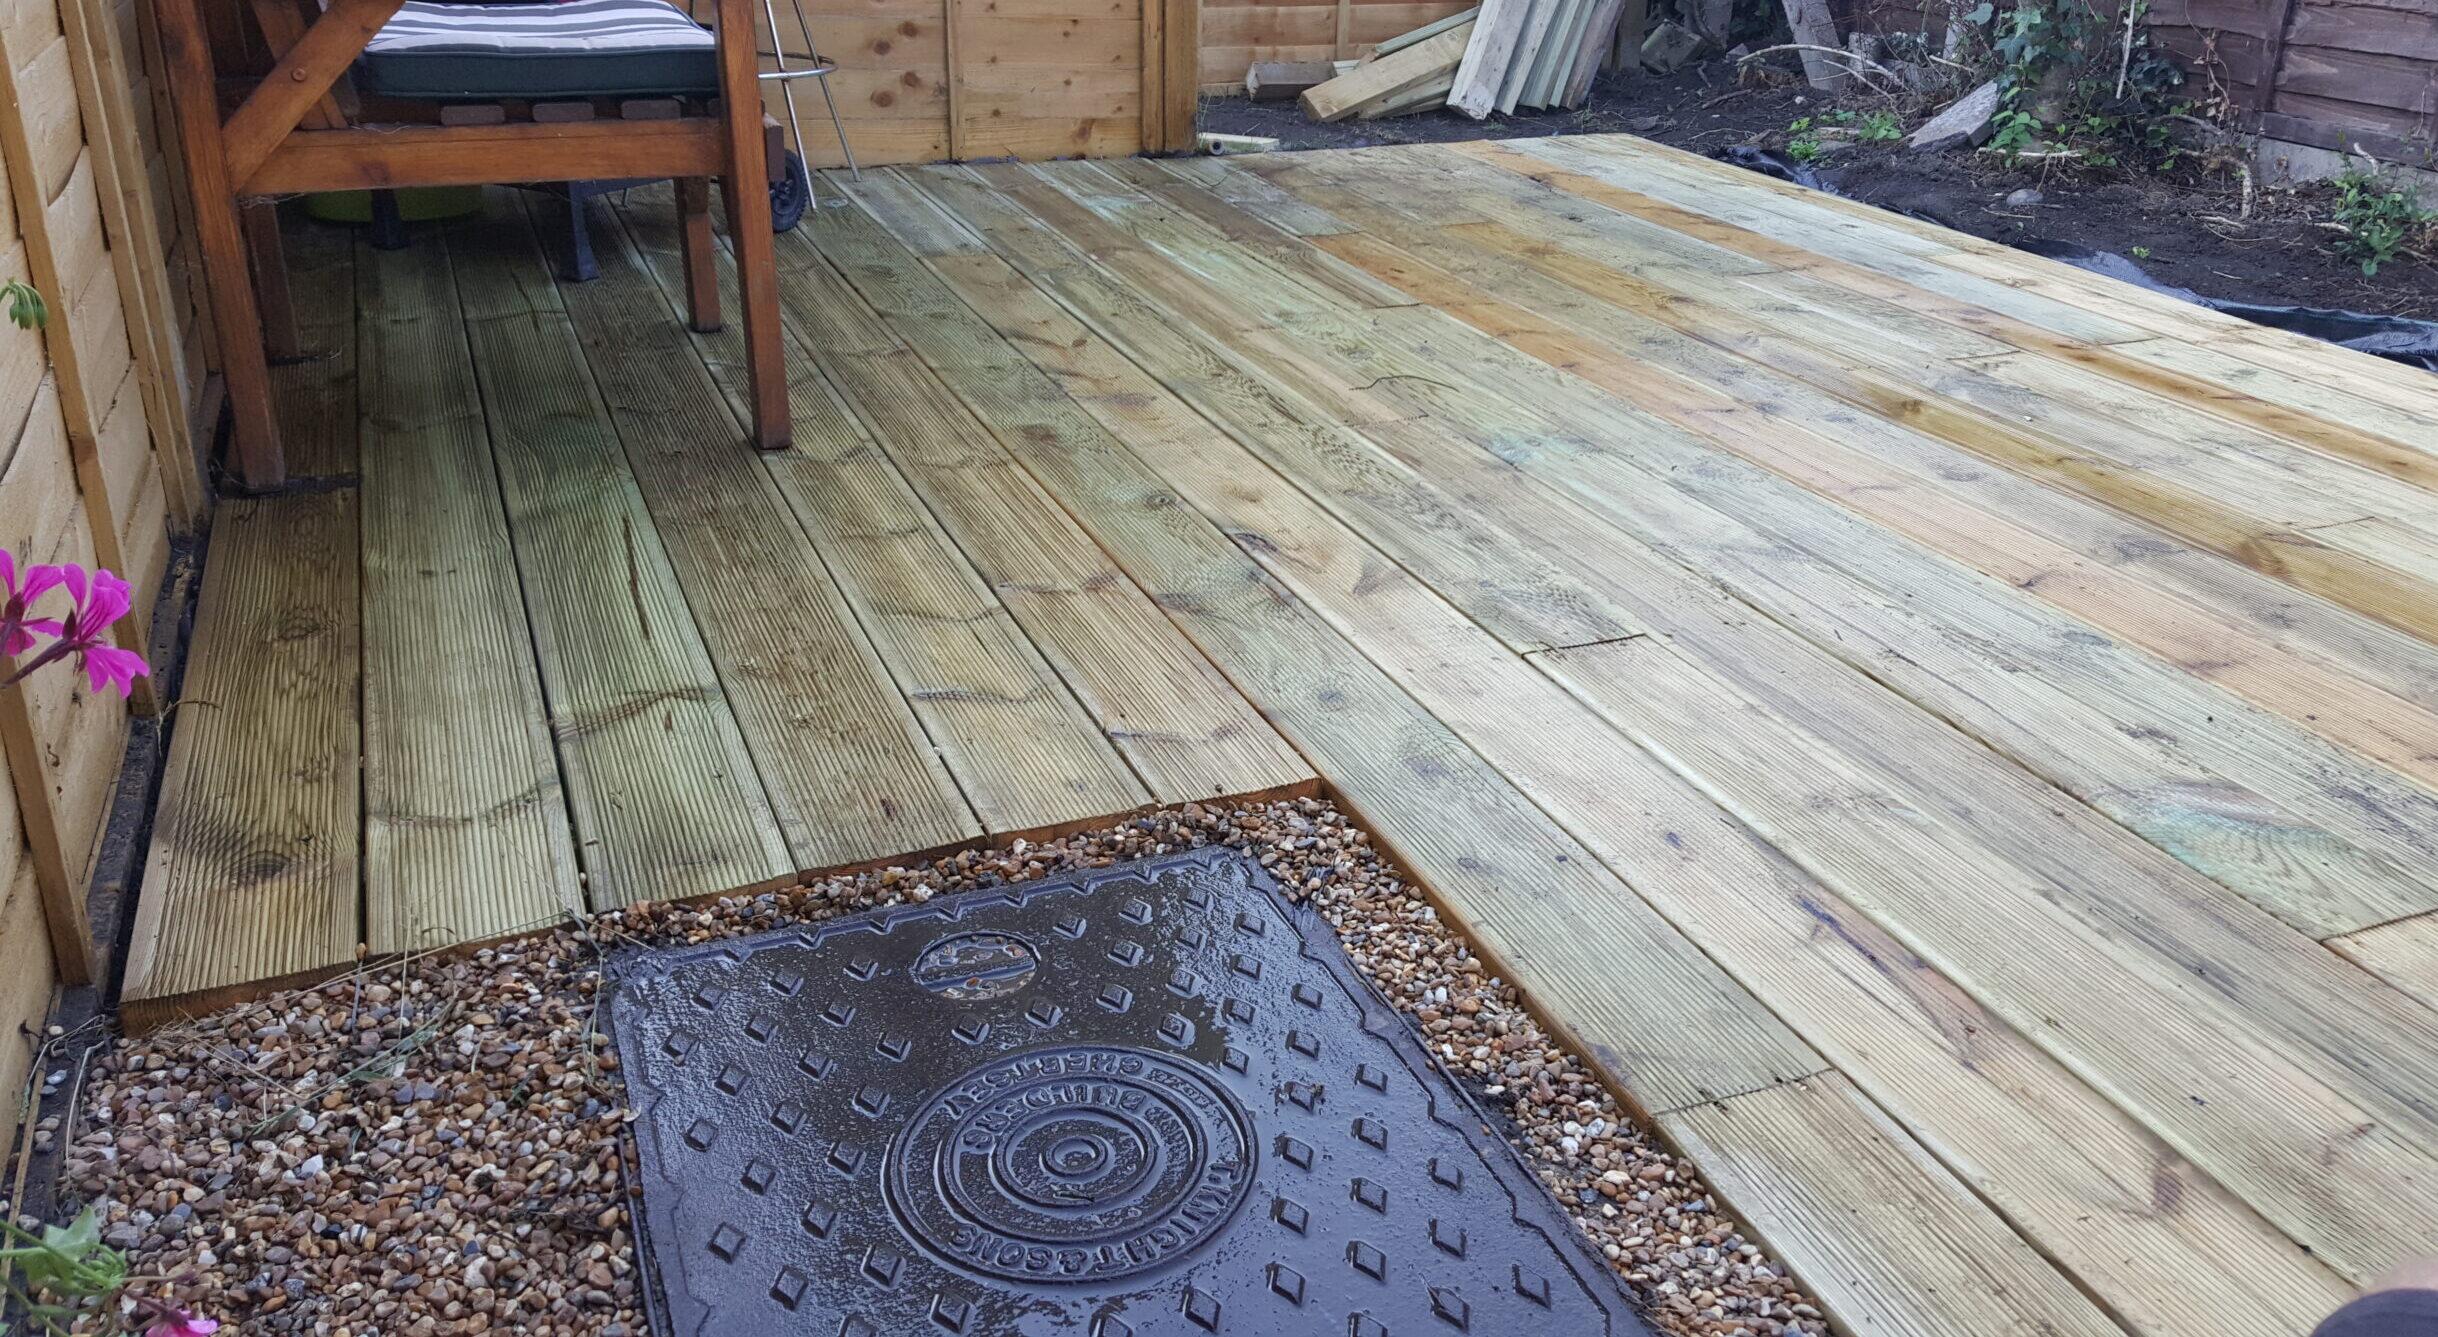 Top Drawer Construction garden decking installation with manhole cover Woking Weybridge Surrey